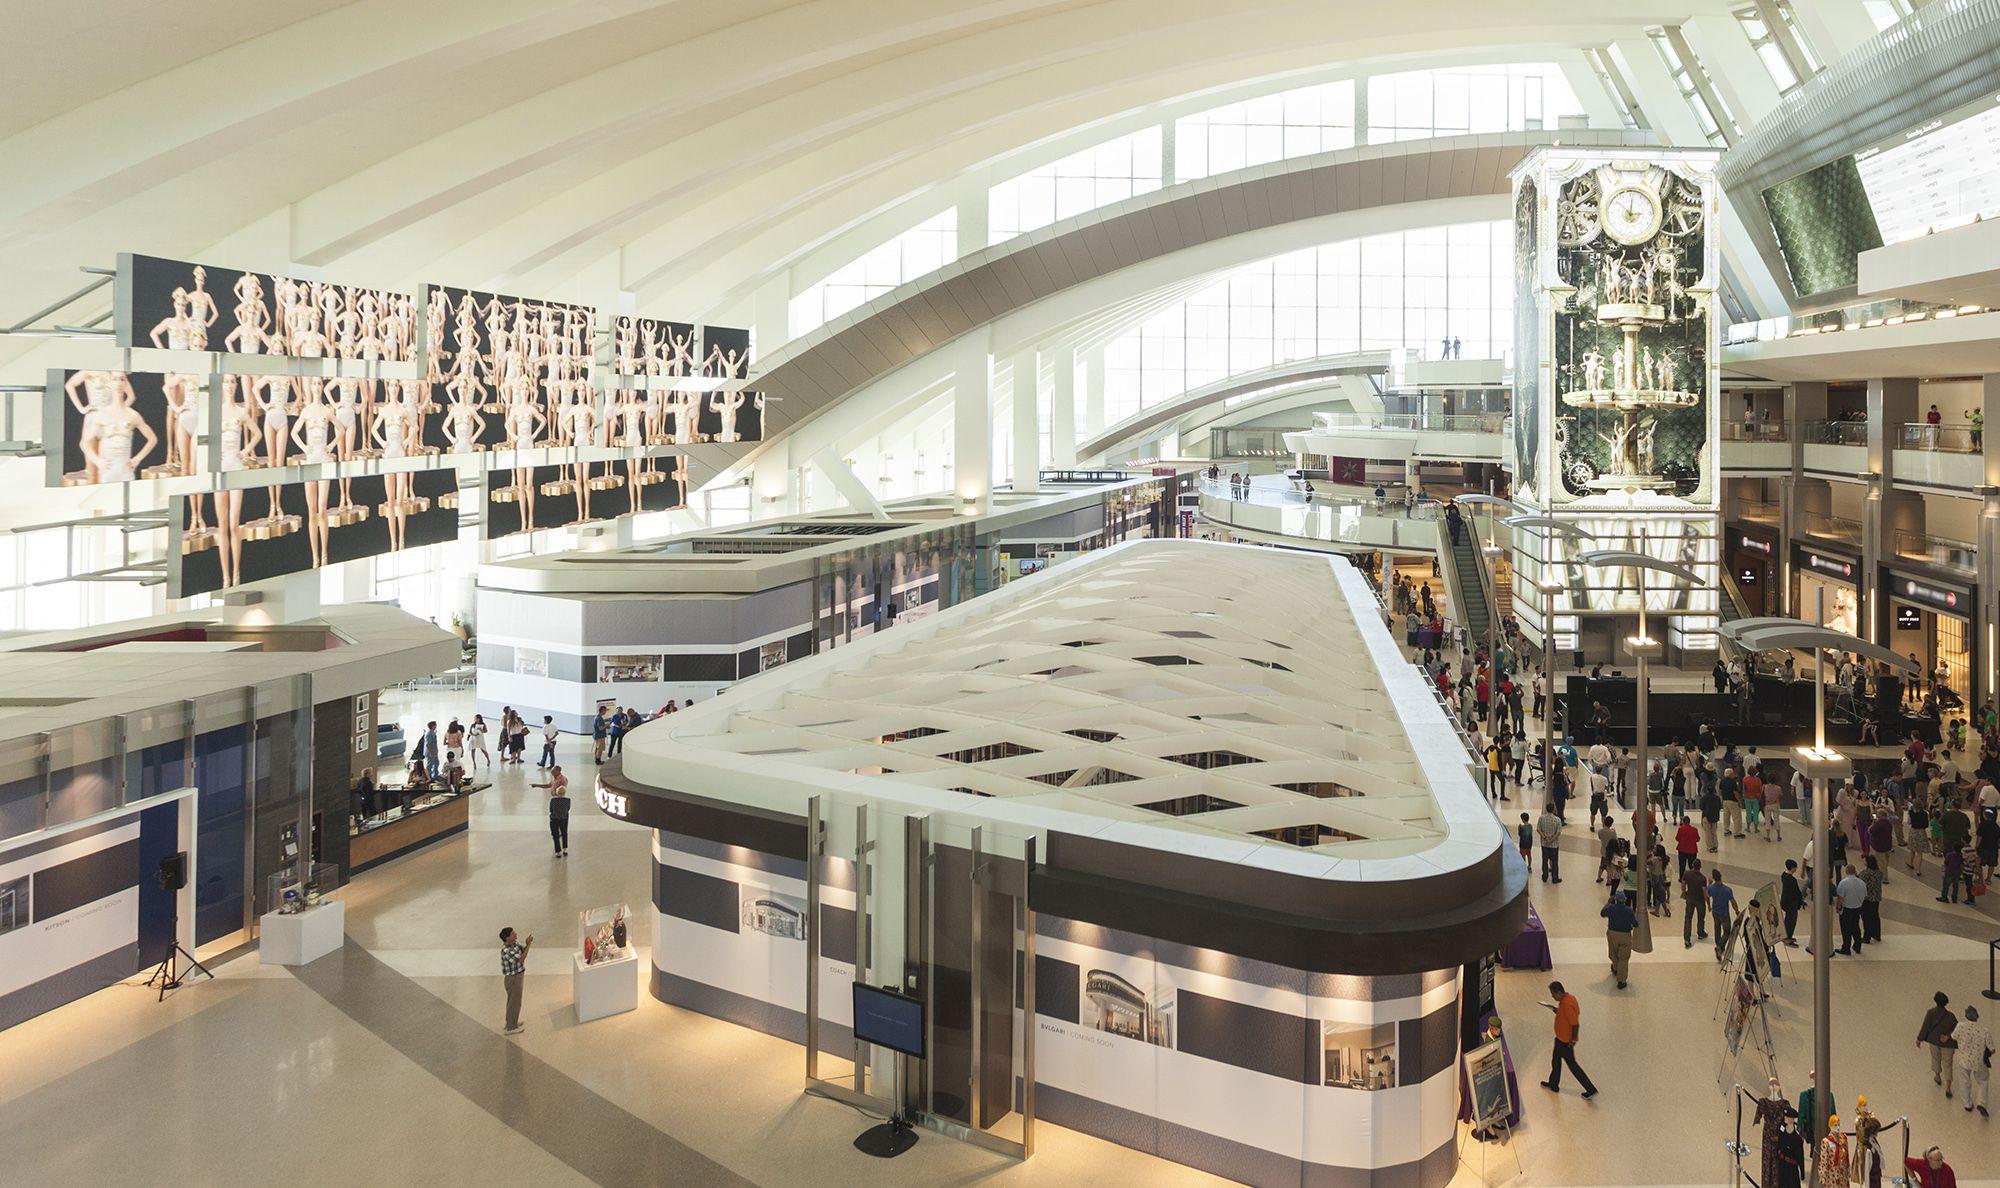 Aeroport LAX Aéroport international, Aéroport, Design